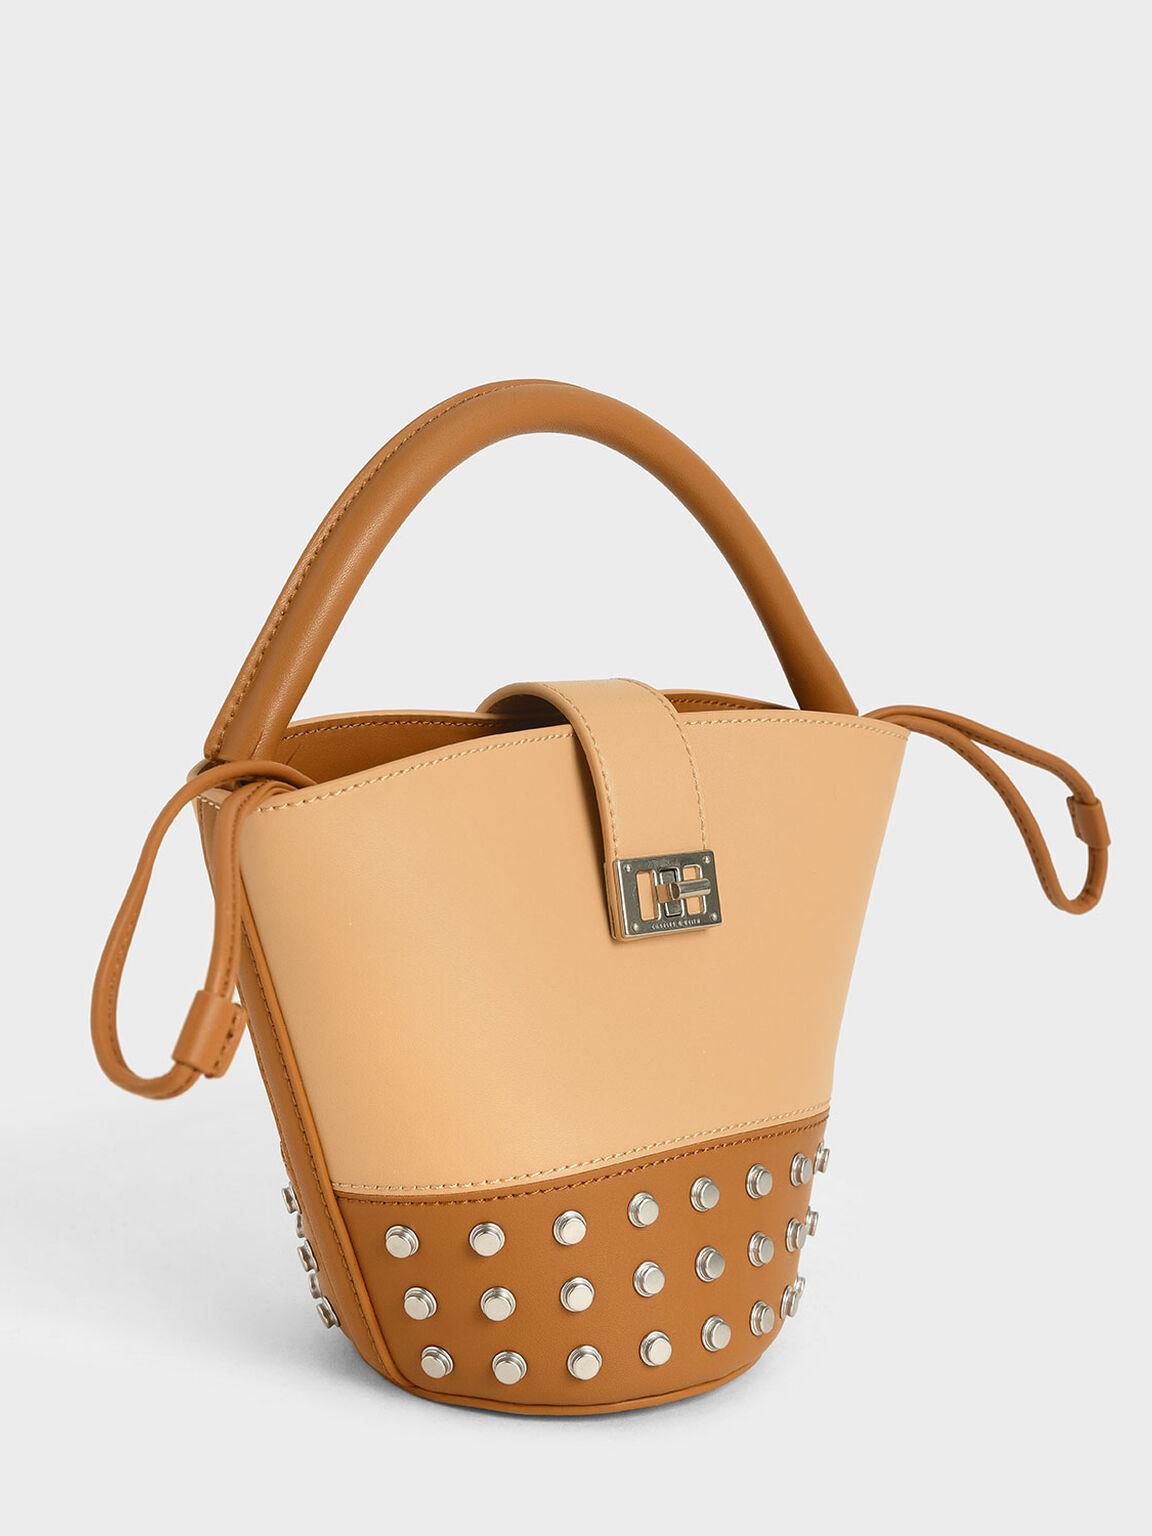 Studded Bucket Bag, Nude, hi-res